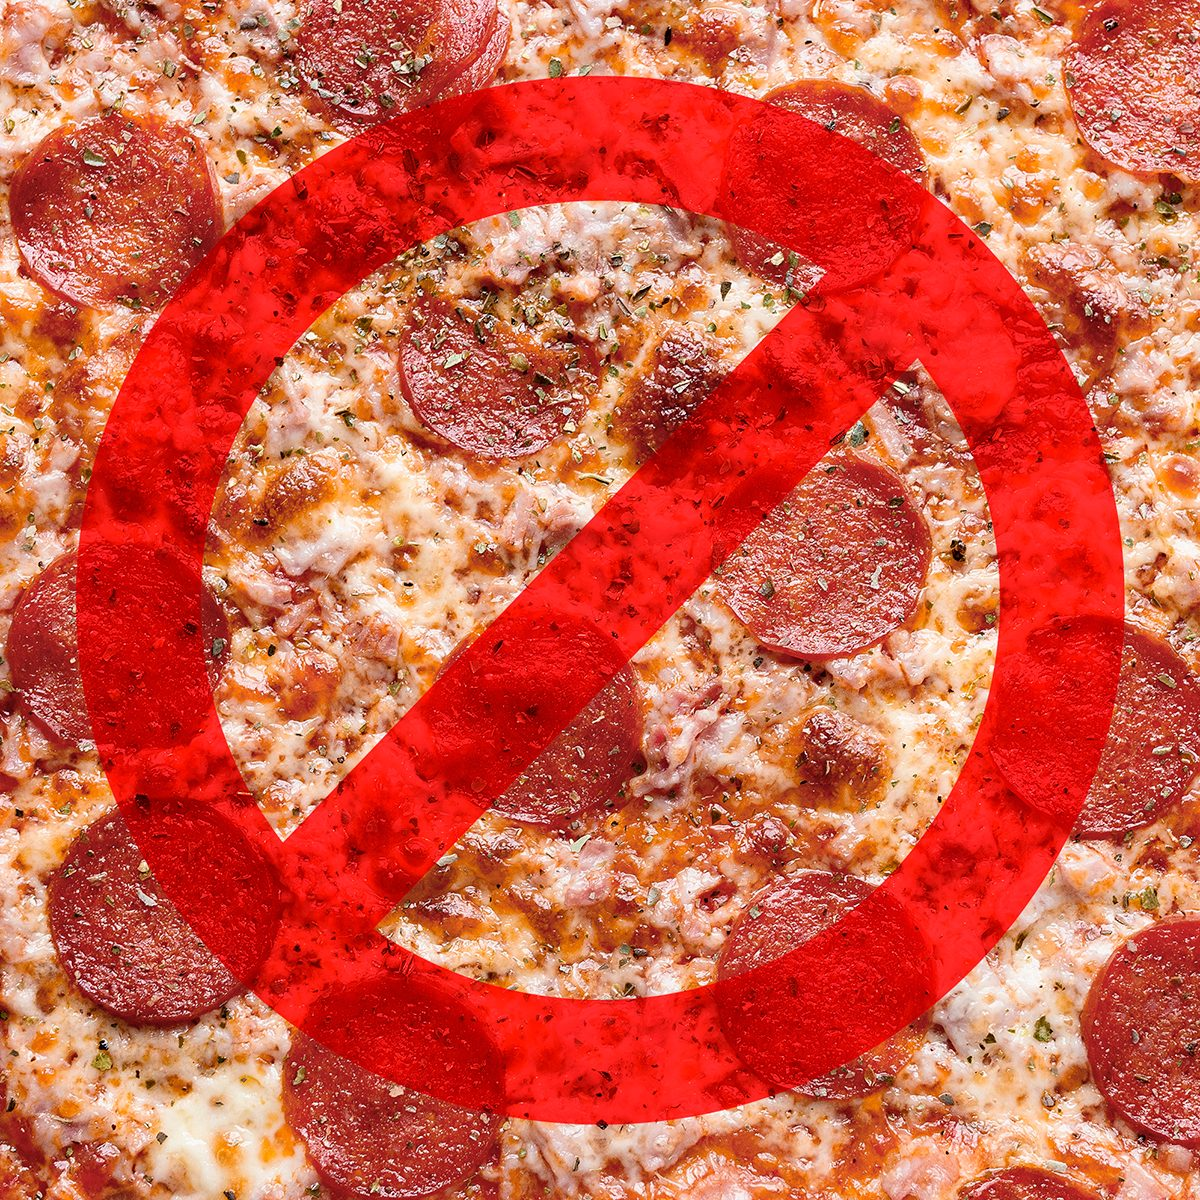 Pizza close-up with a no symbol